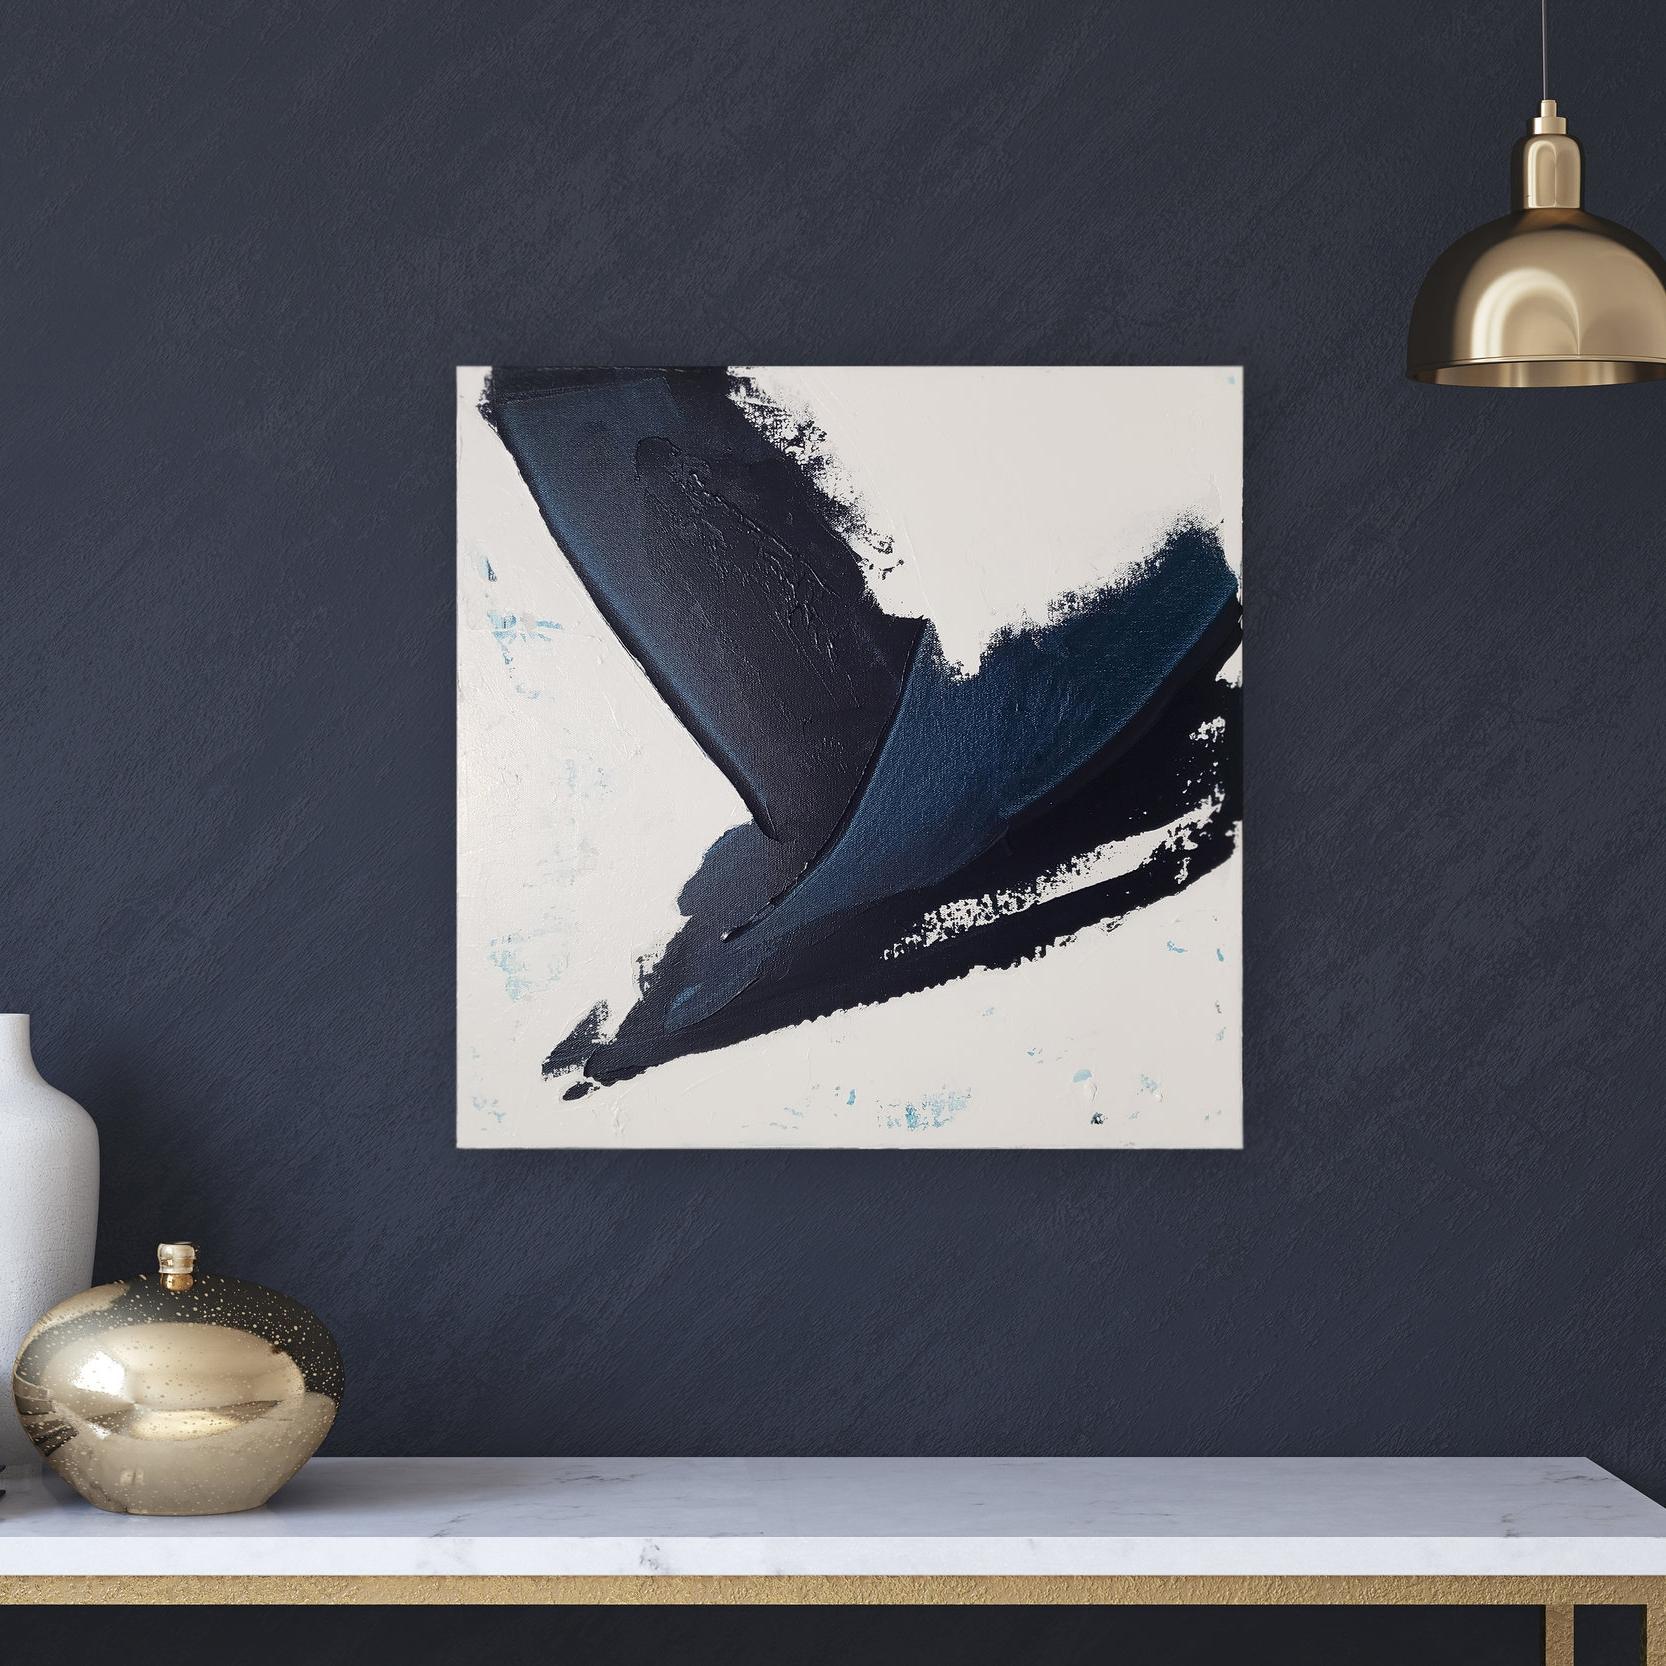 "Gust   $200. 20x20"". Acrylic on canvas. 2018."